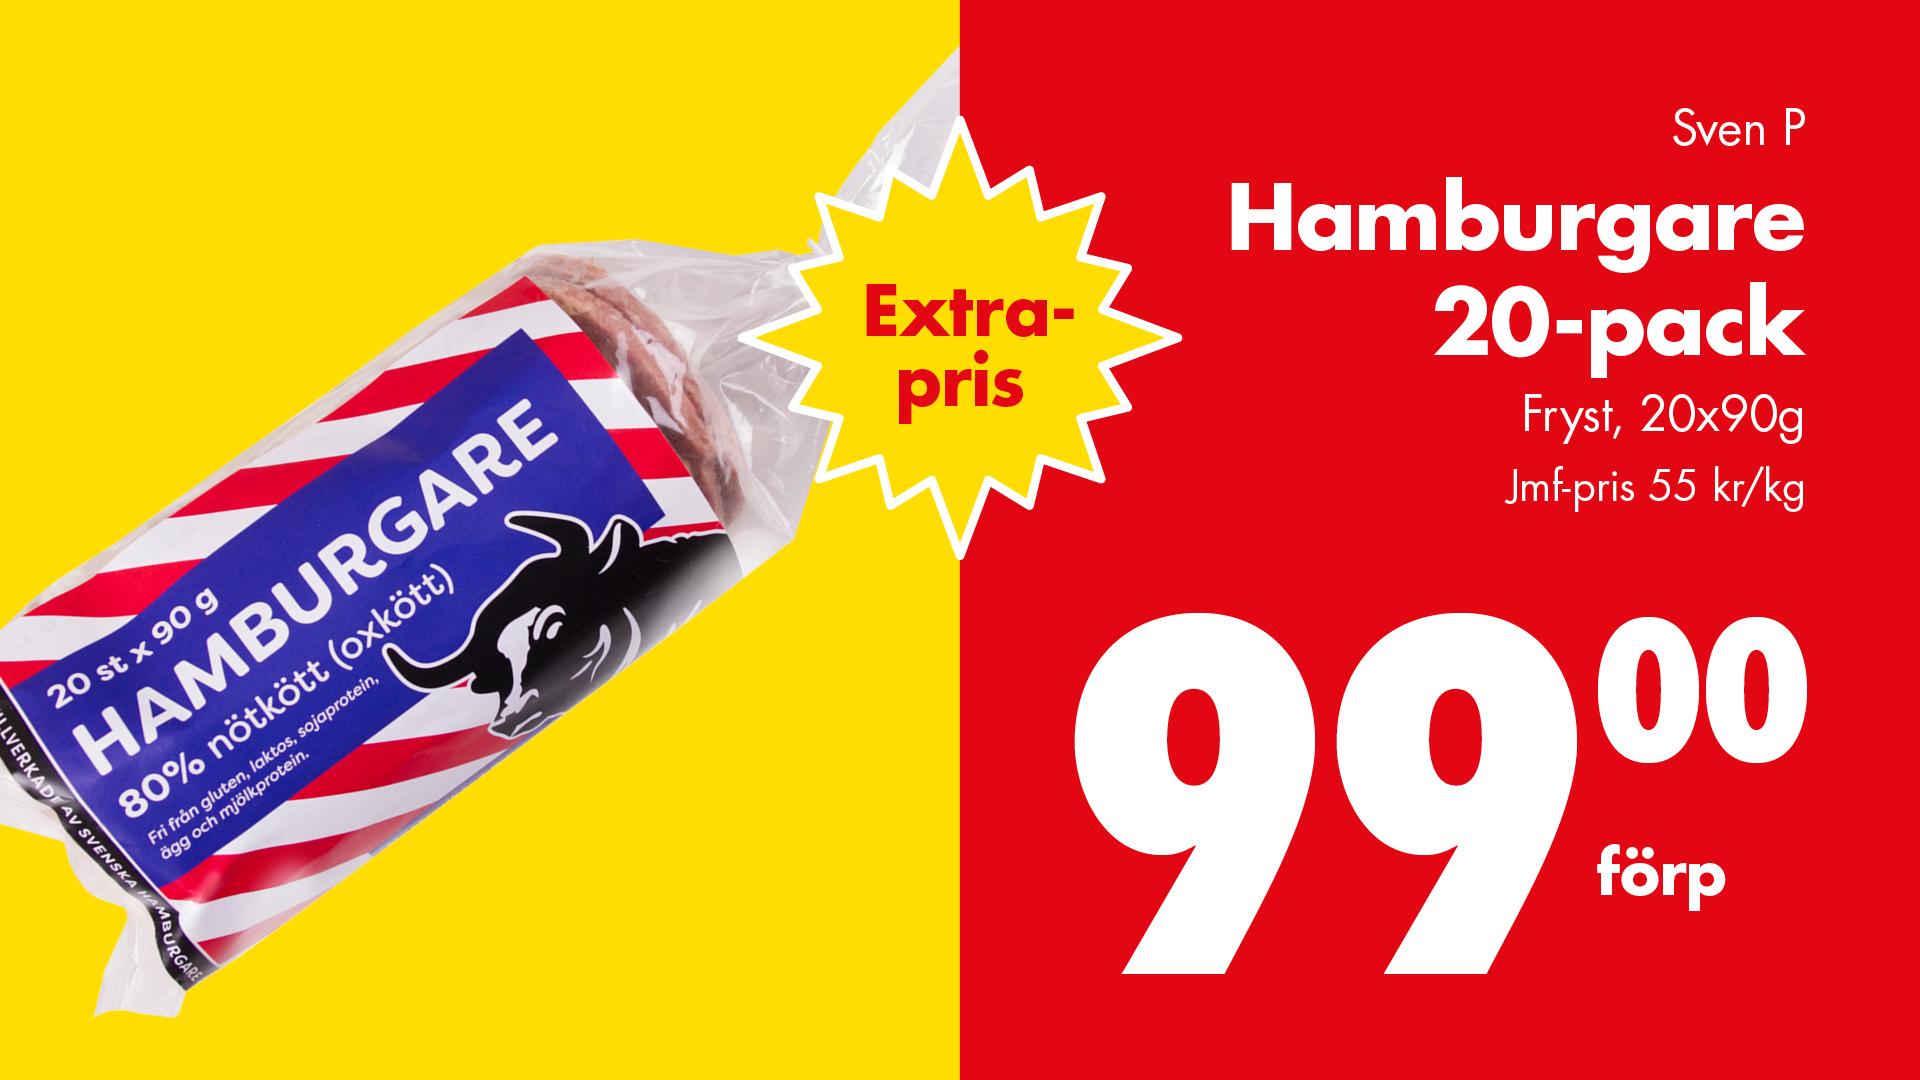 v03_1980x1080px_hamburgare20pack